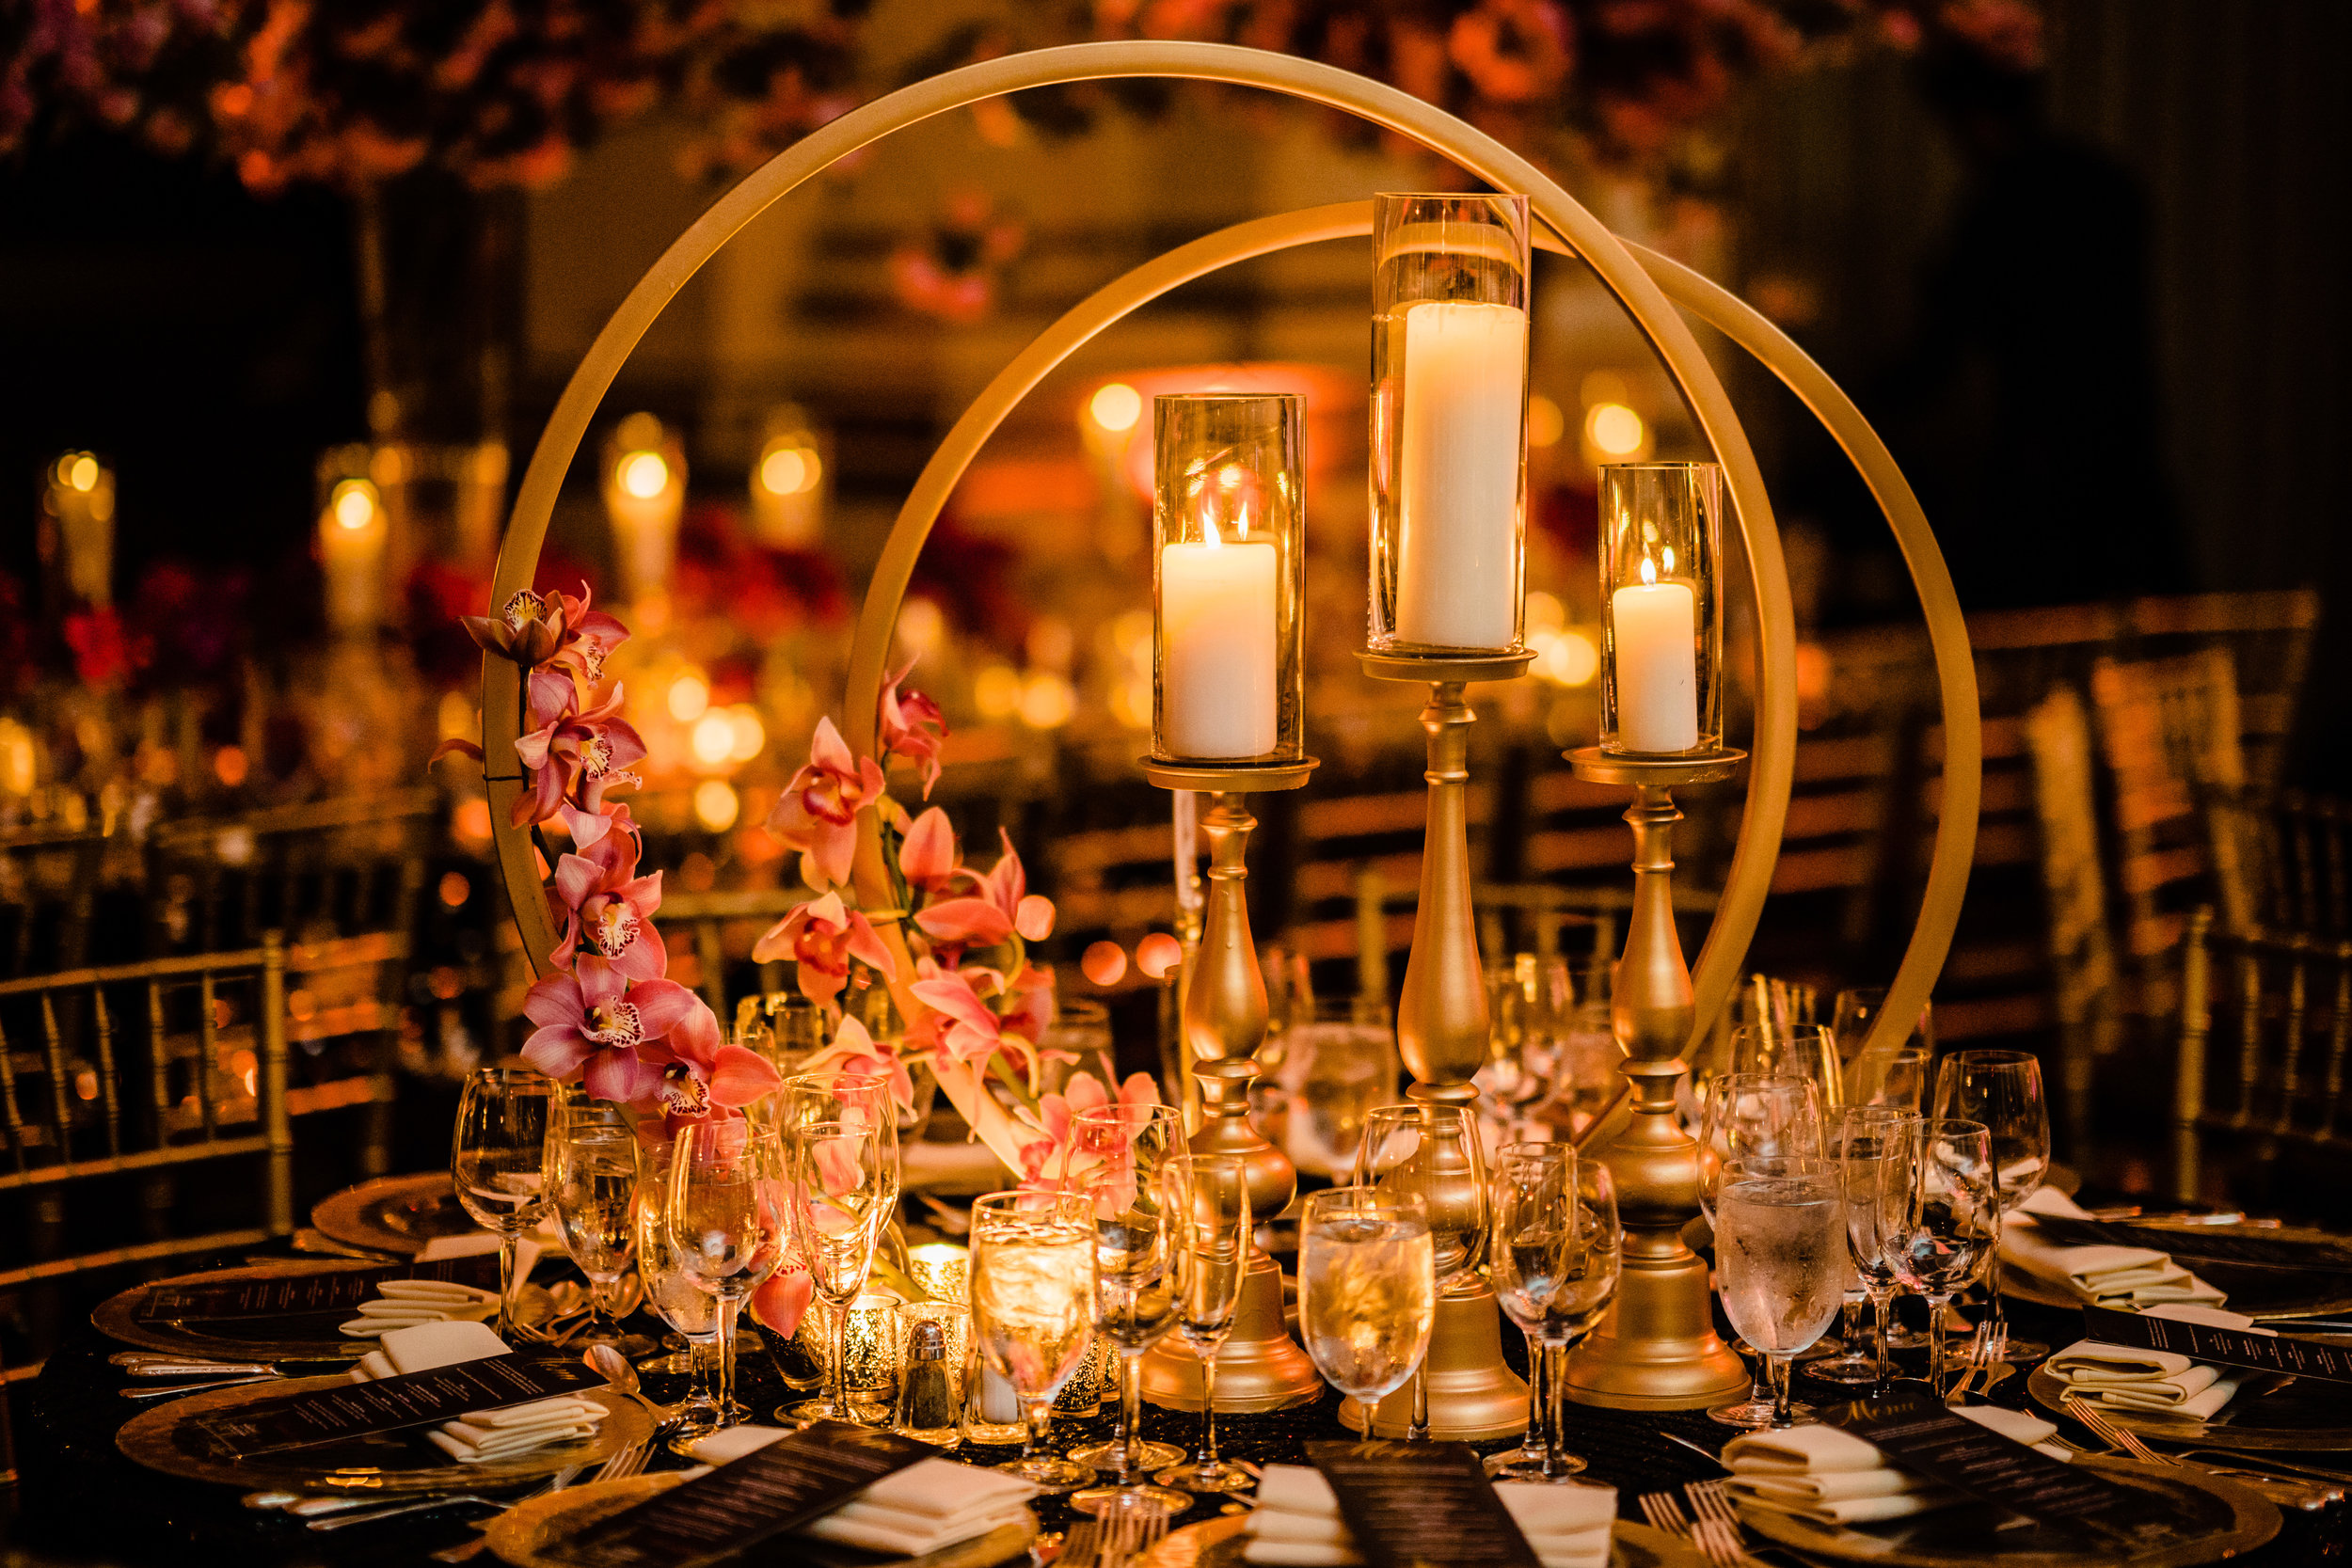 INDIAN WEDDING TABLE DECOR2.jpg